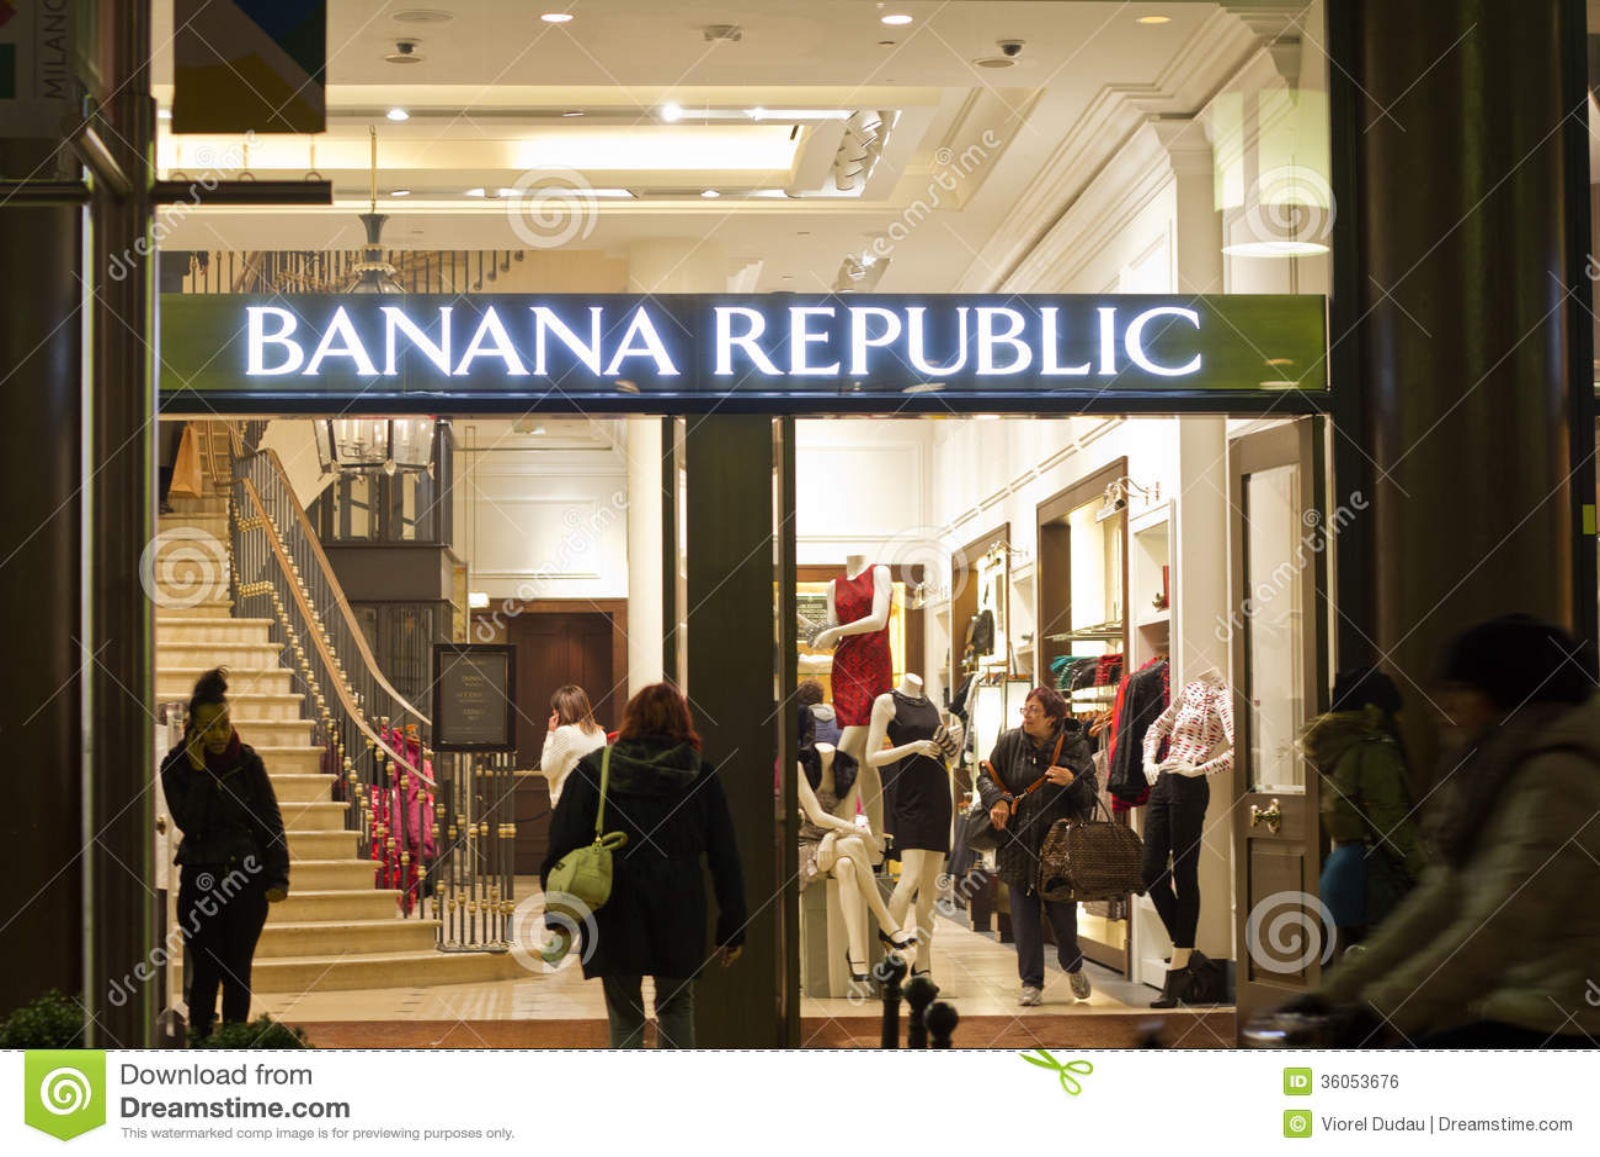 Banana republic clothing store